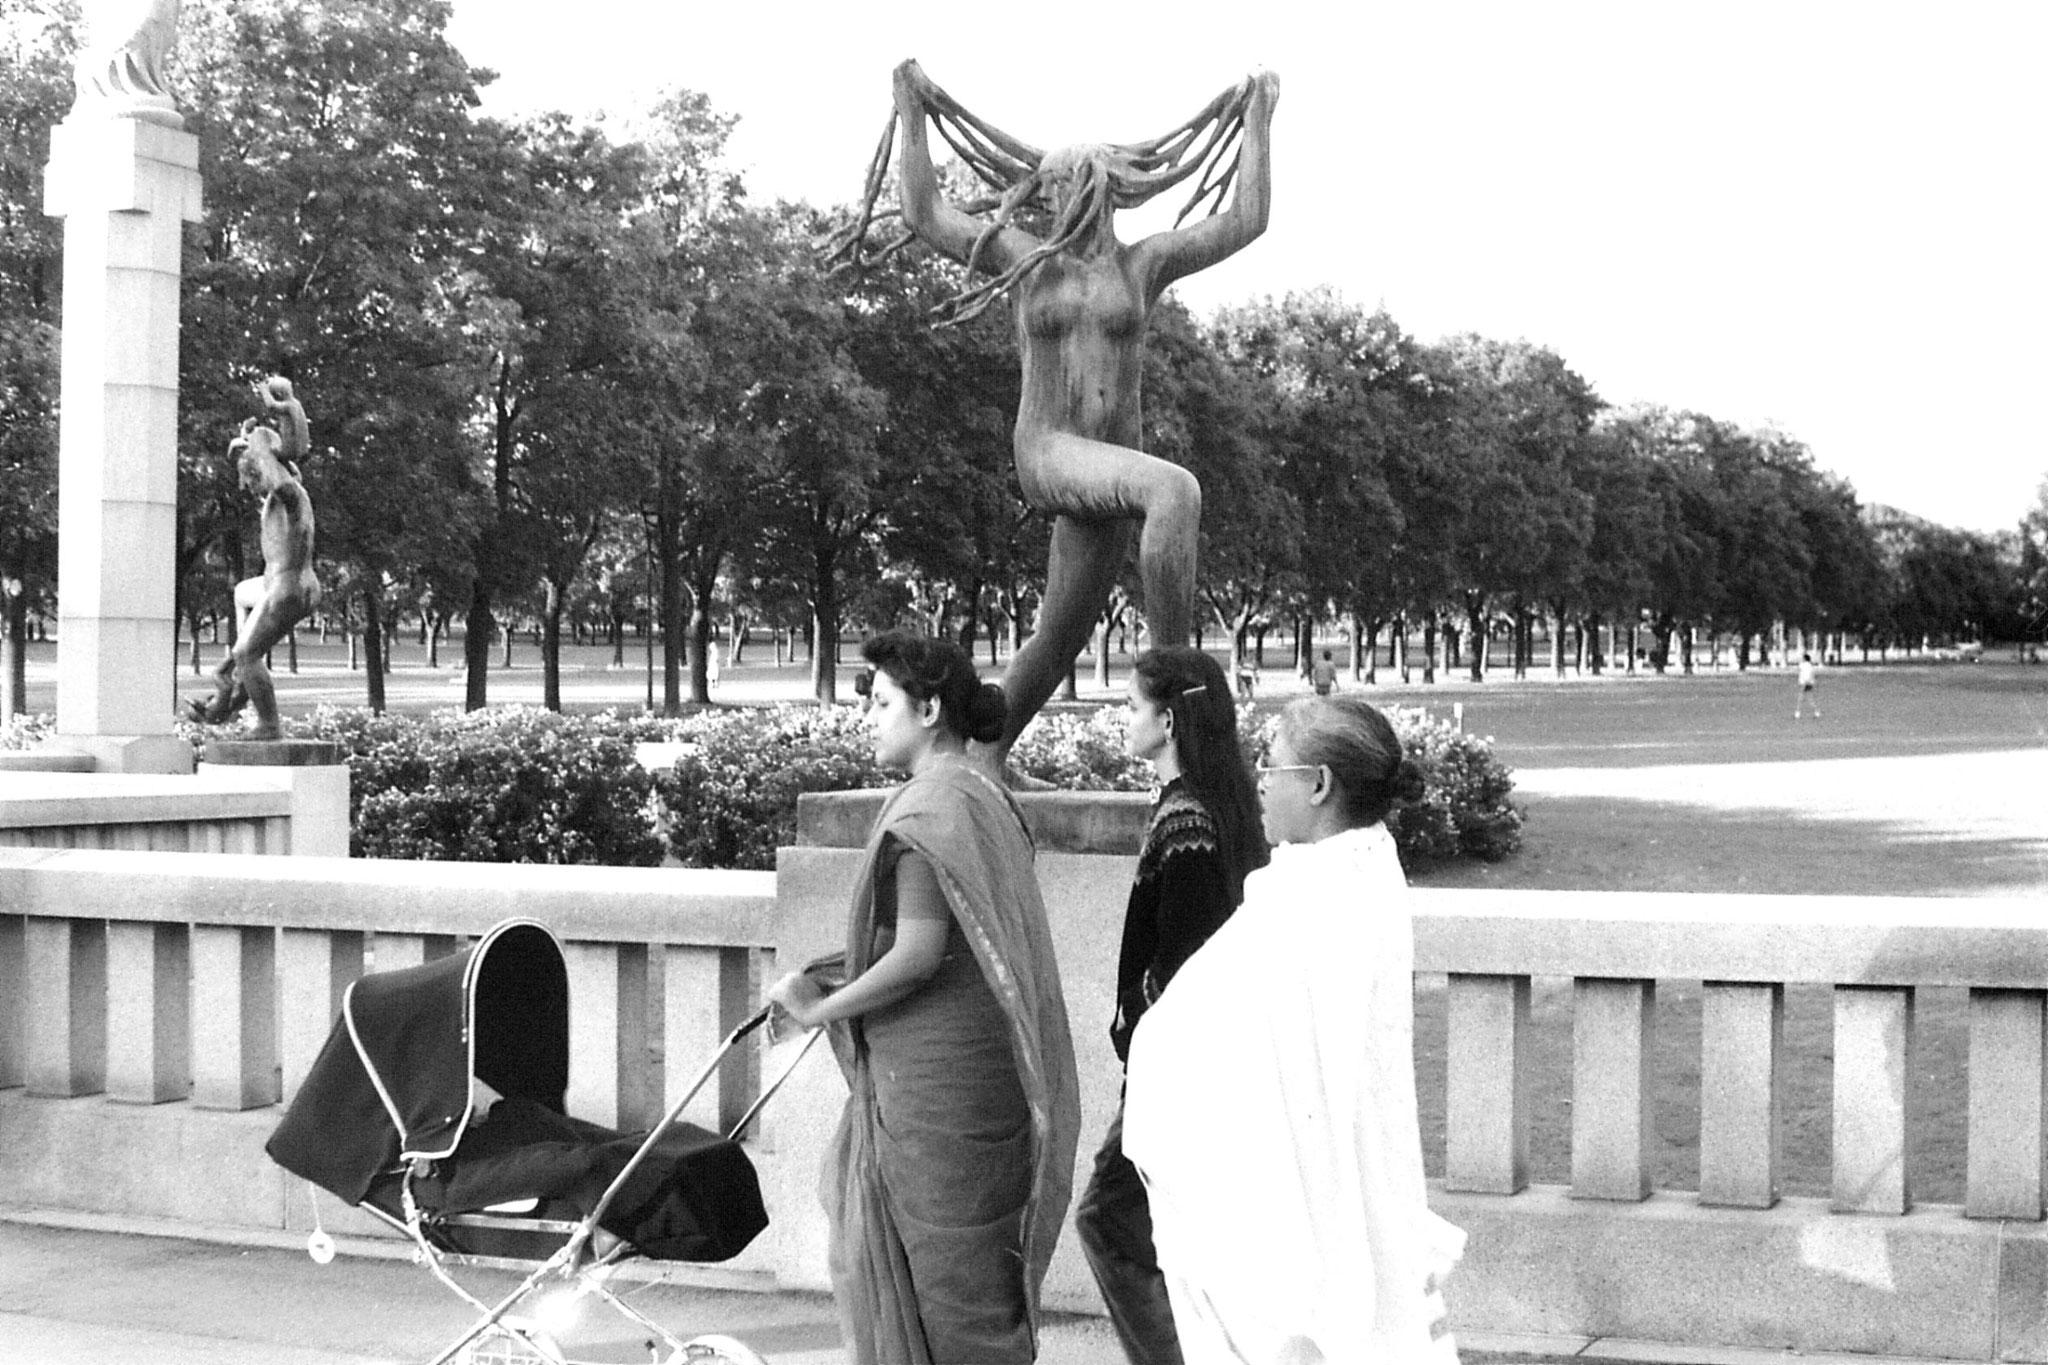 17/9/1988: 17: Vigeland sculpture park